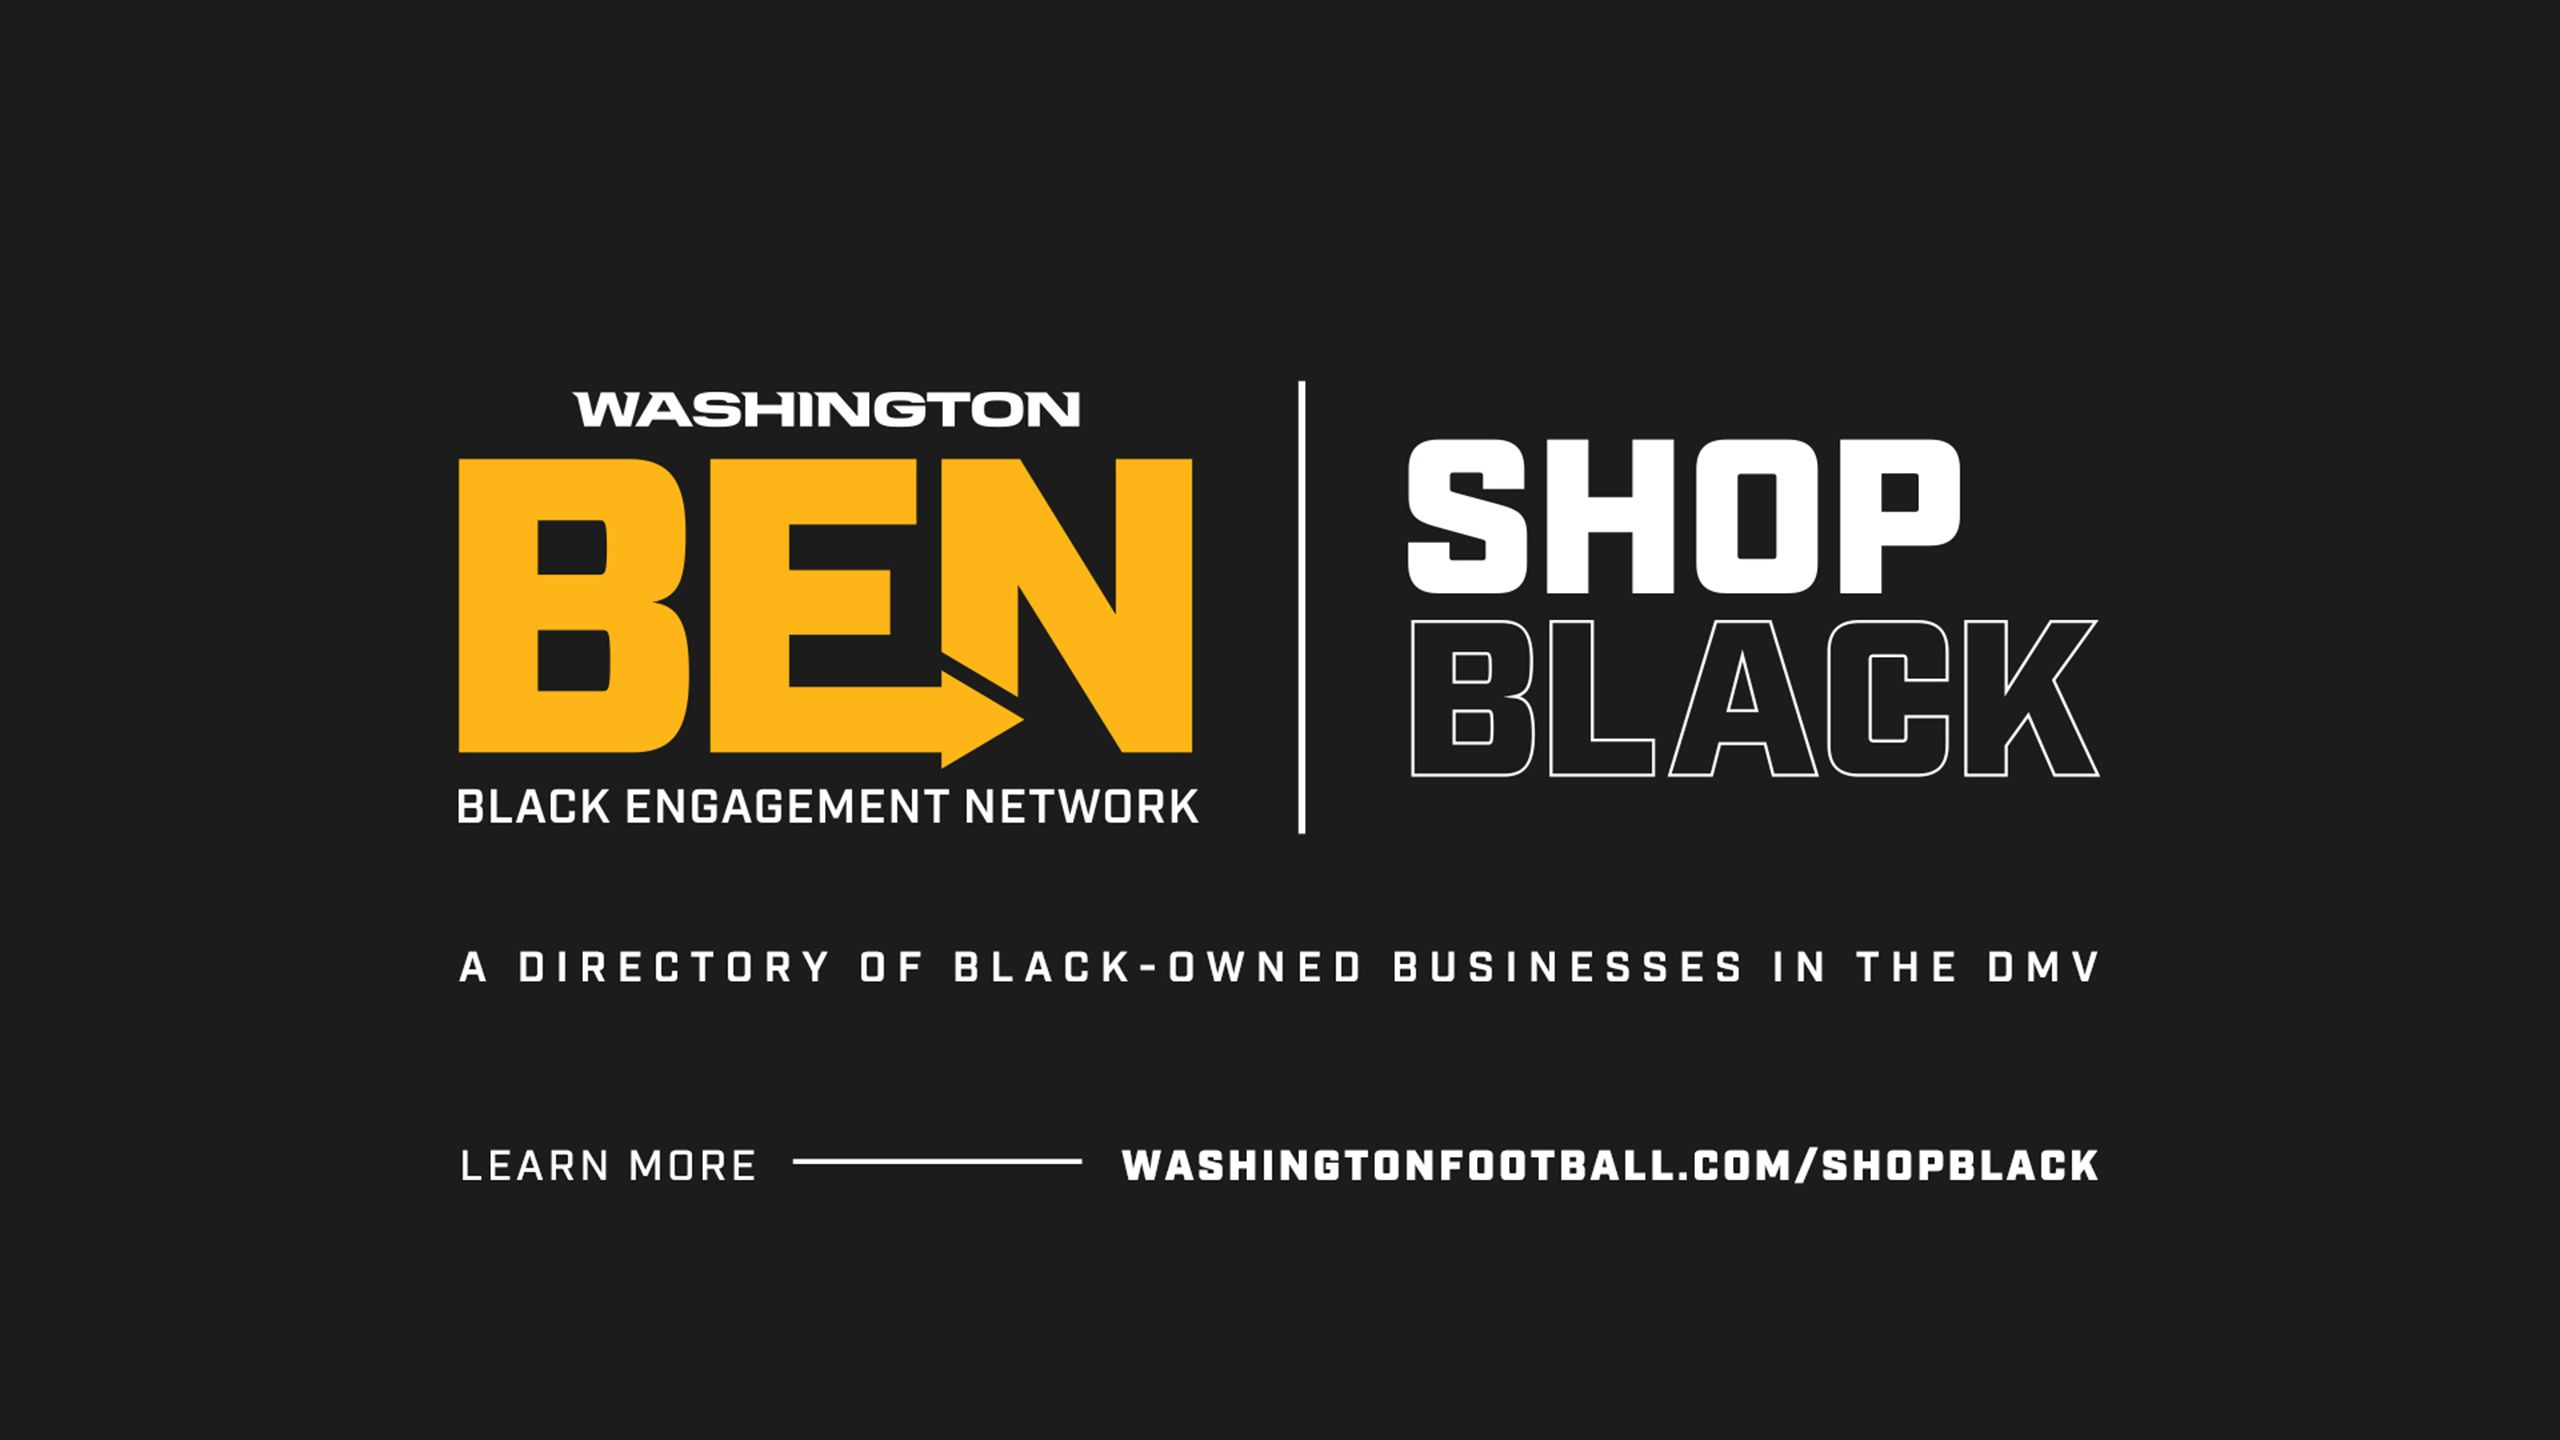 Washington BEN Shop Black Directory